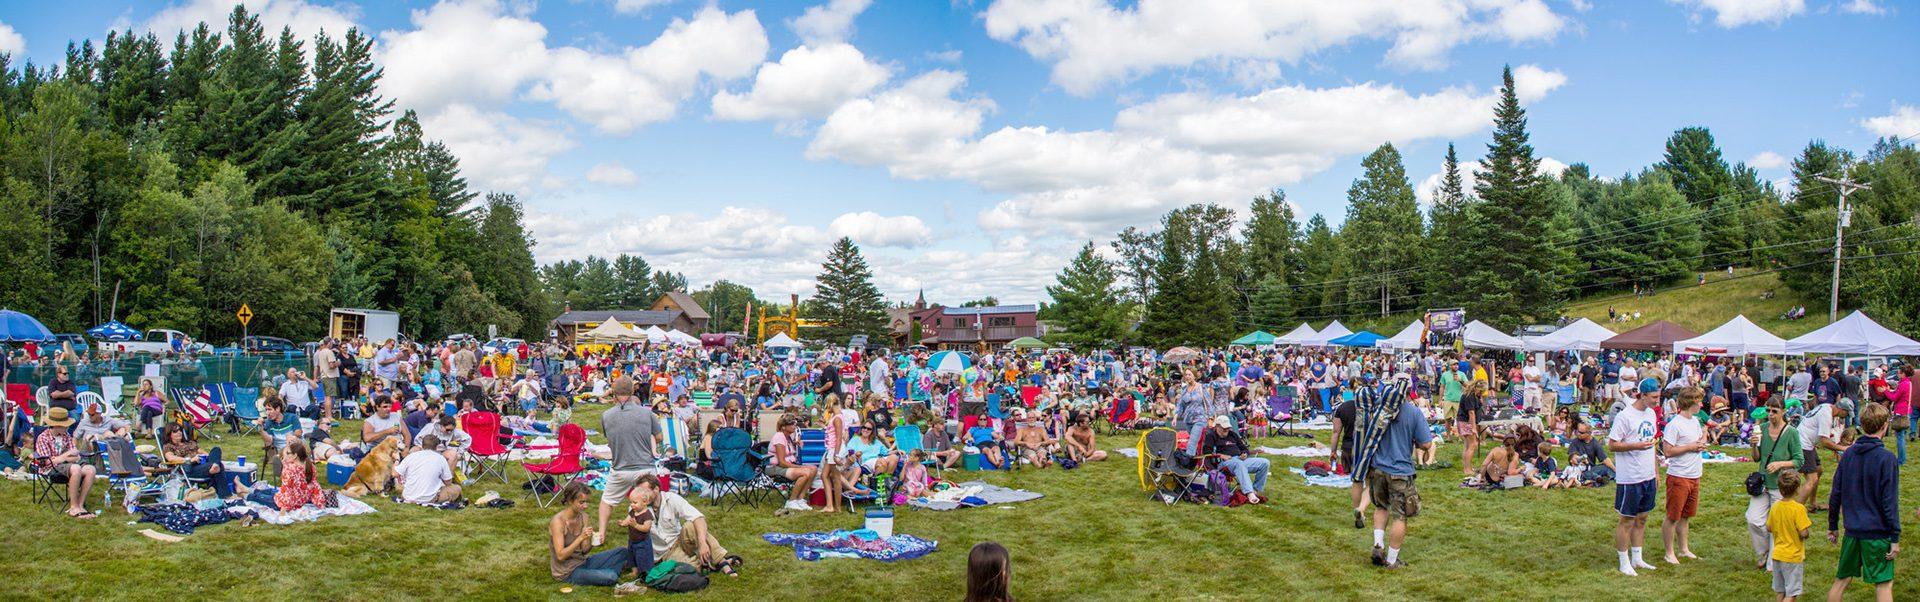 august west festival header